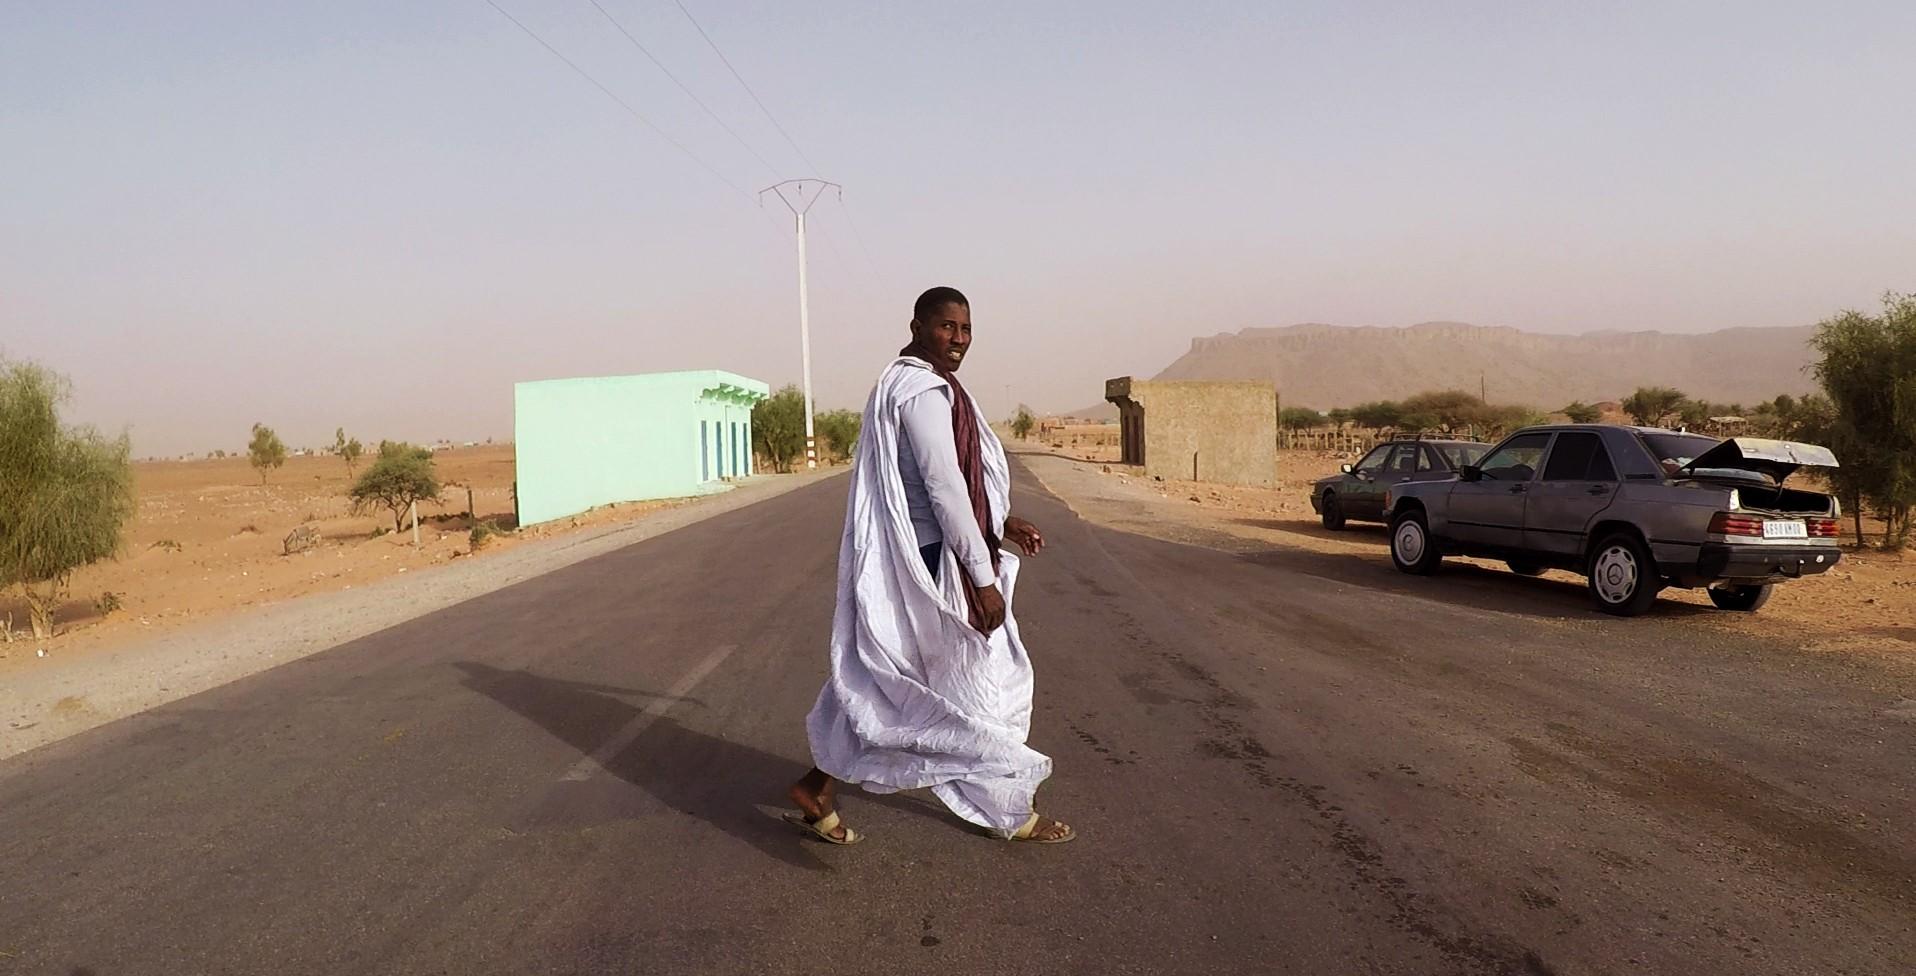 ruta mauritania pablocaminante - Mauritania 4/5, Nouakchott a Gogui